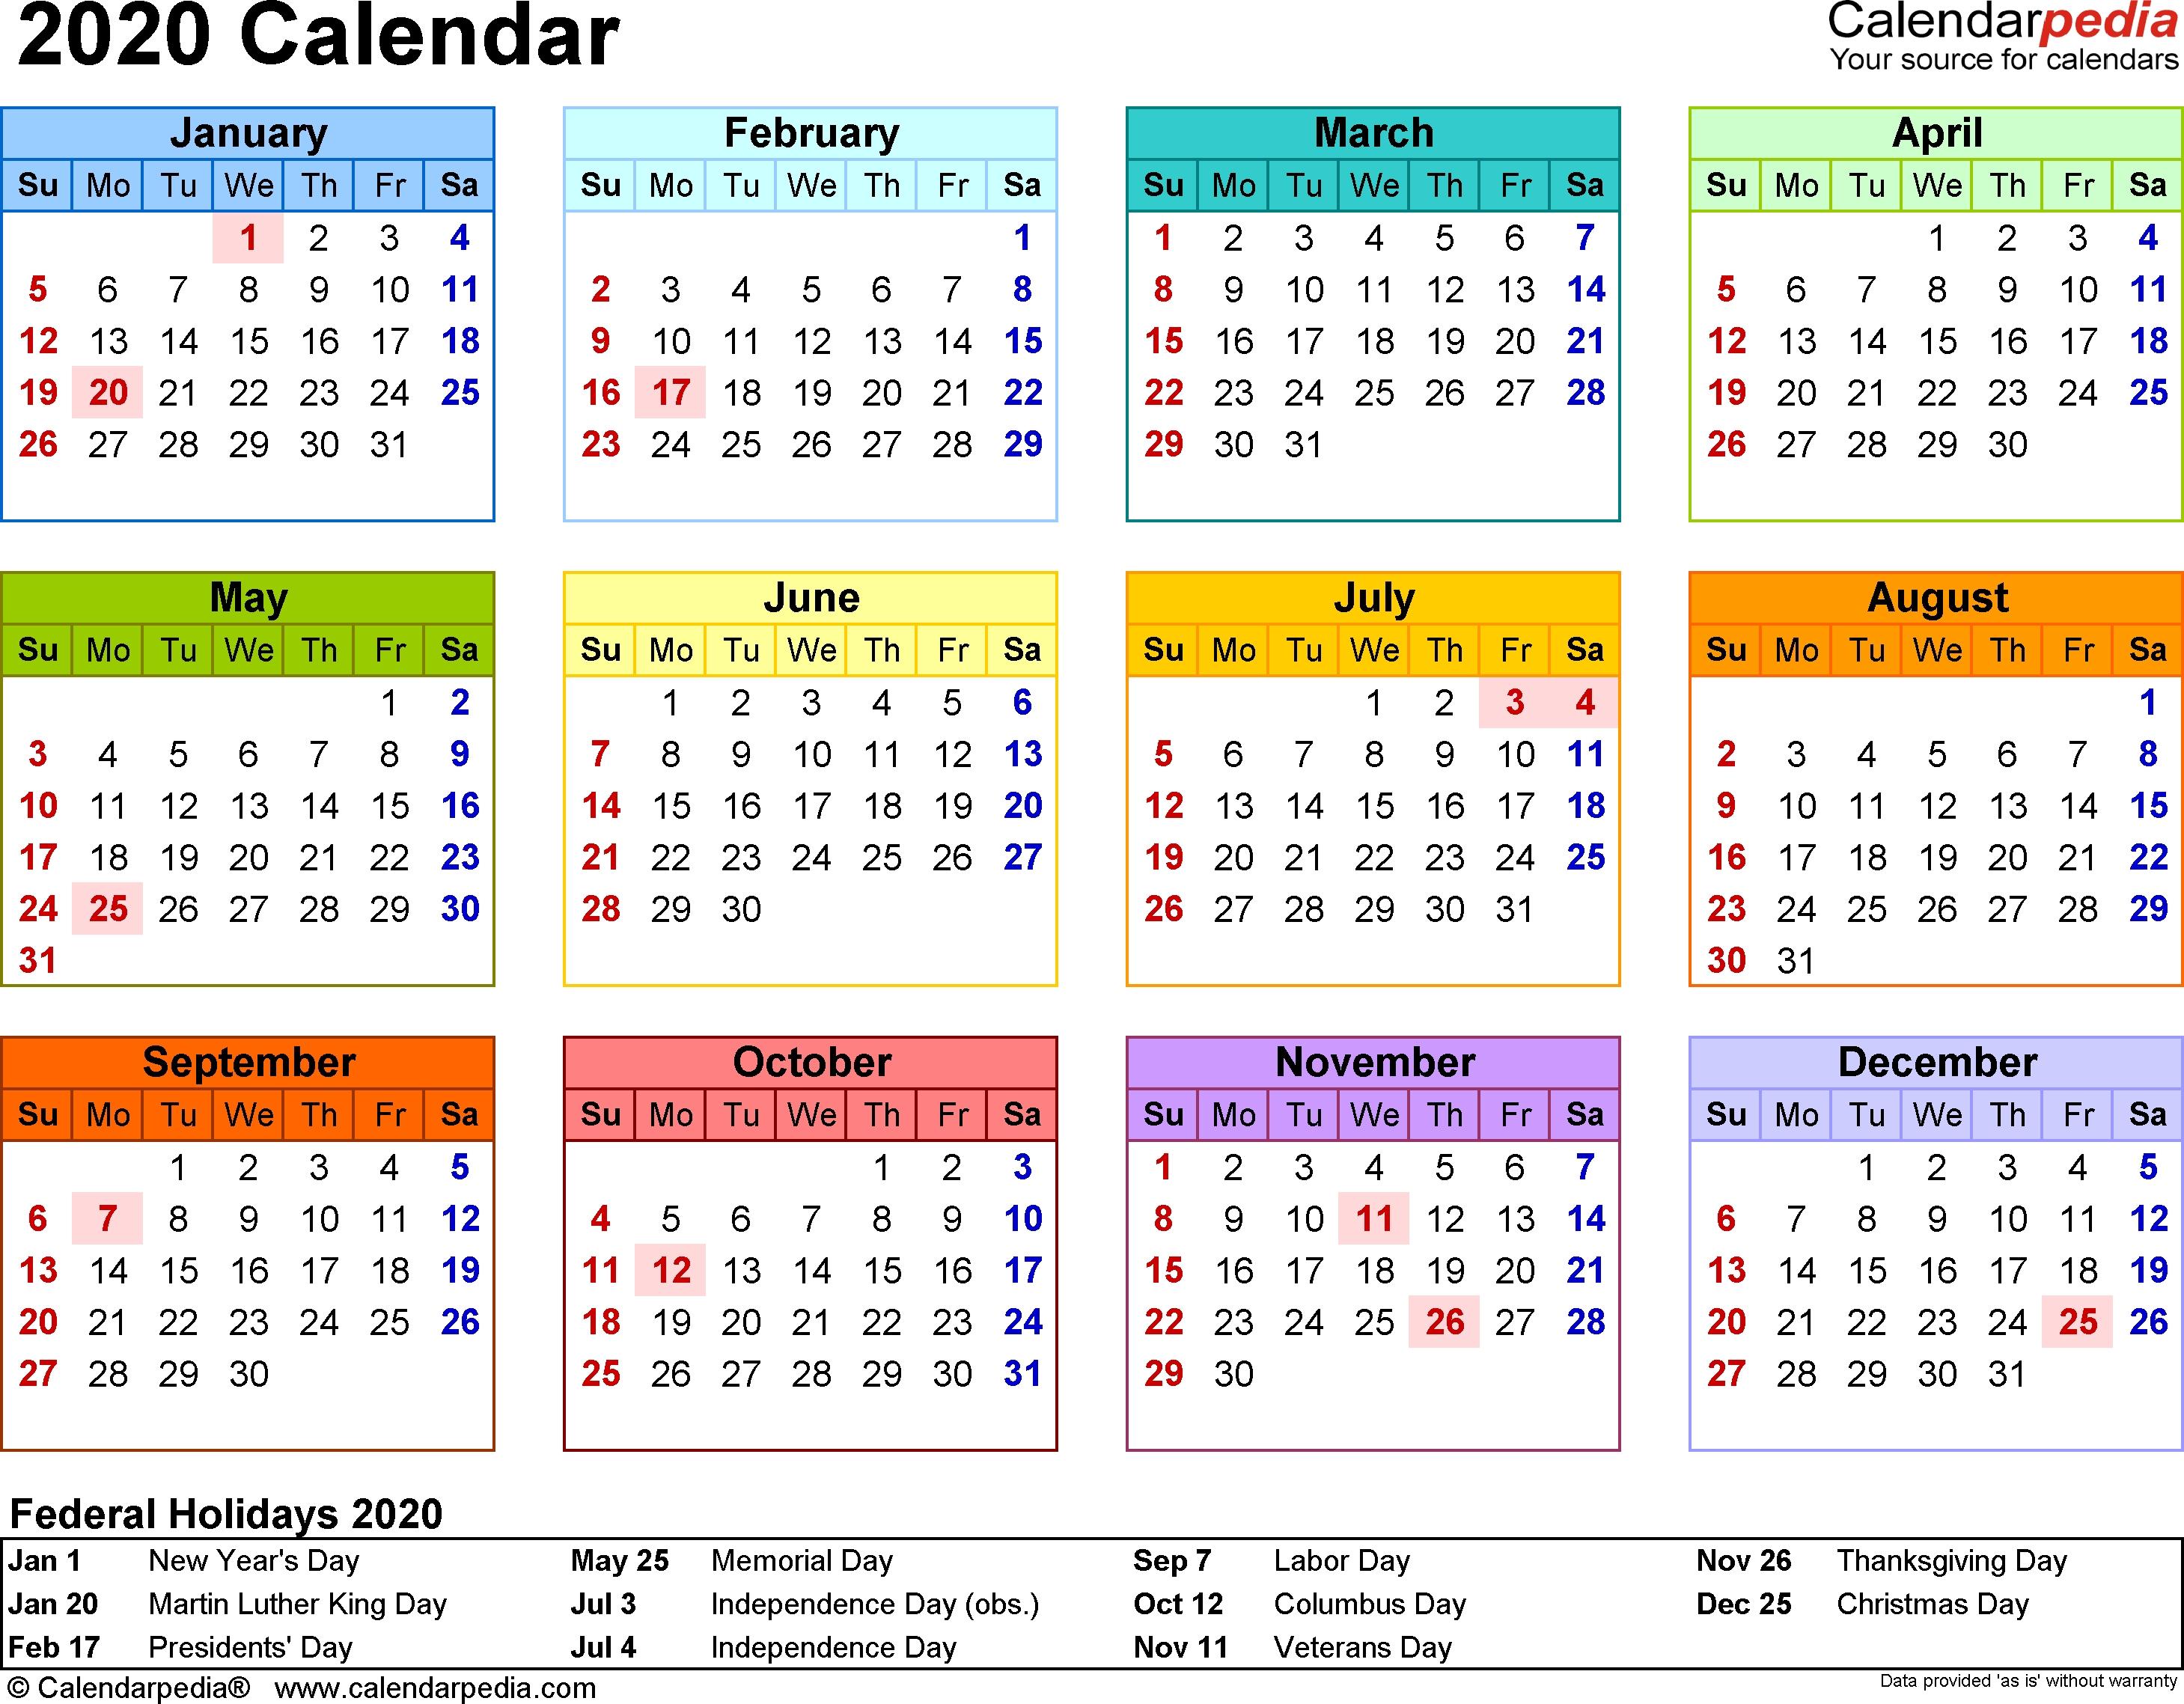 2020 Calendar - 18 Free Printable Word Calendar Templates-Shift Schedule Calendar Template 2020